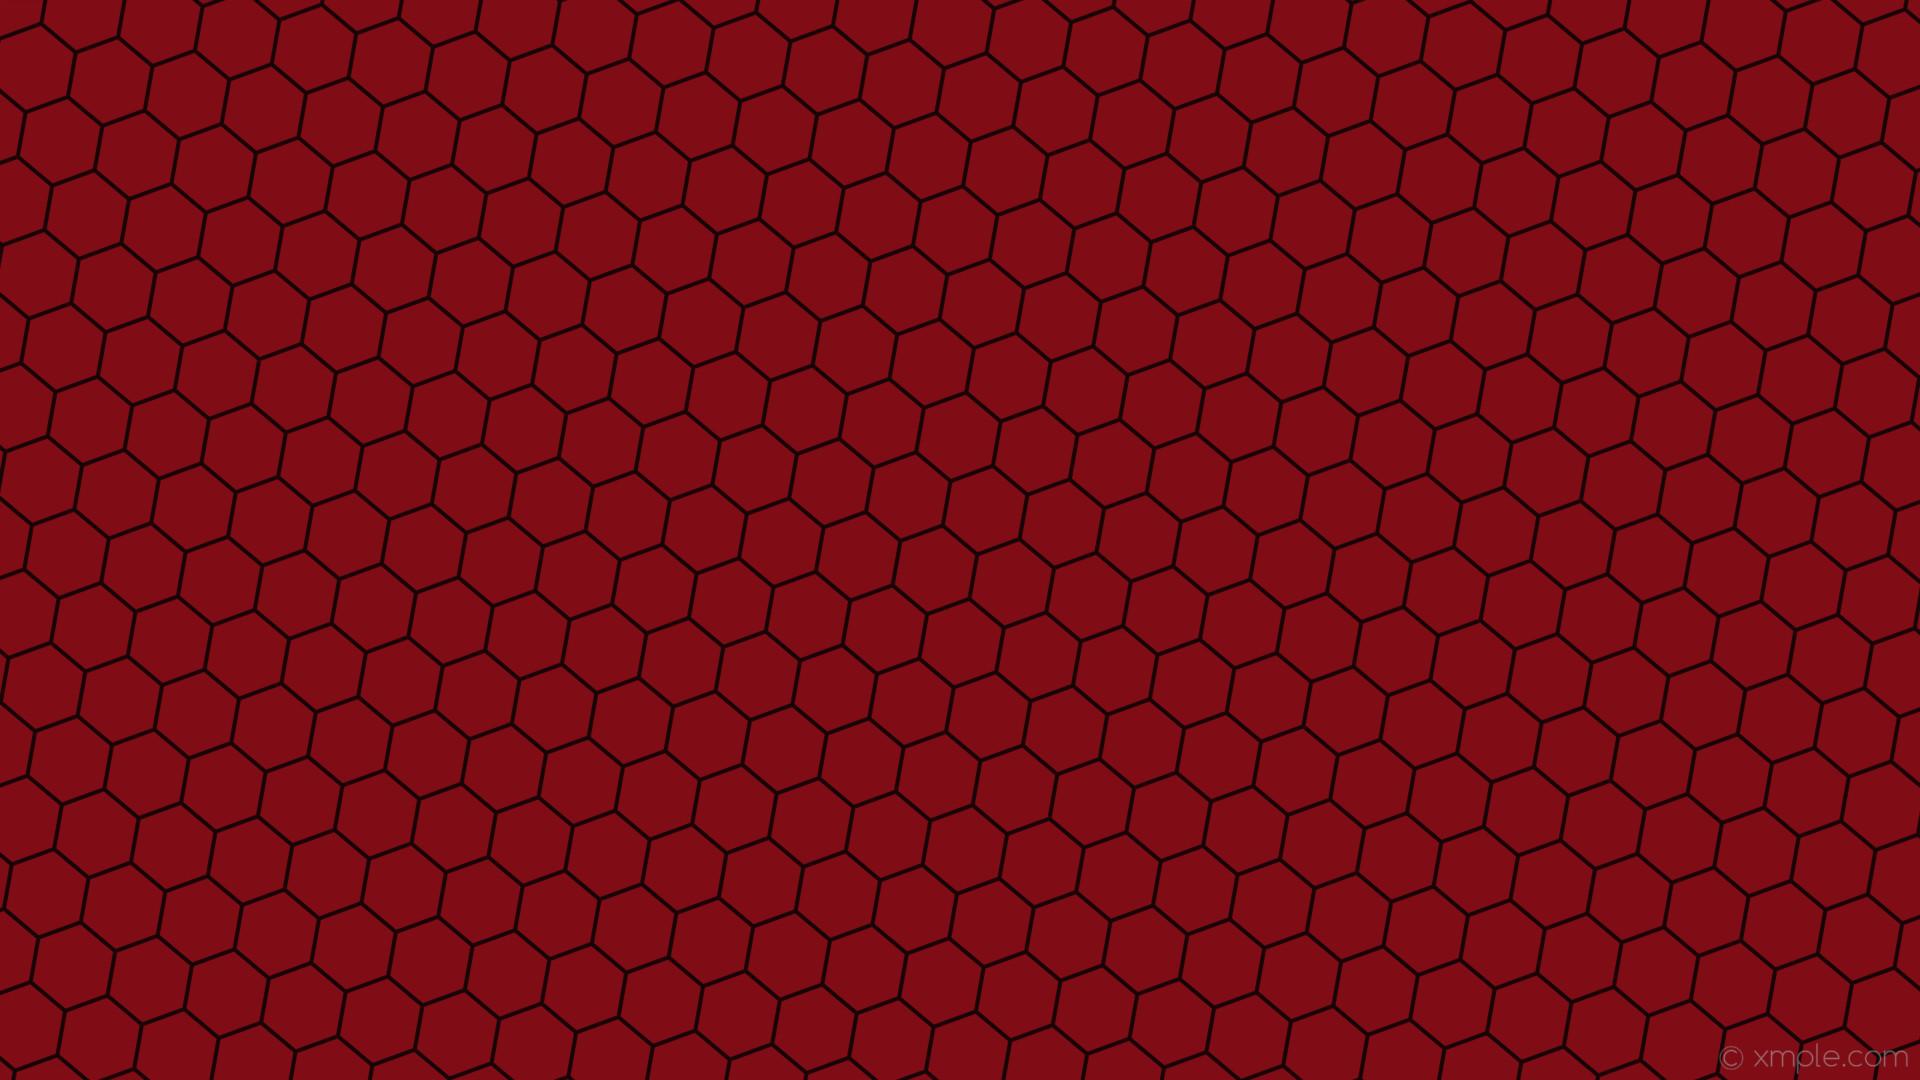 wallpaper honeycomb red hexagon beehive dark red #800c16 #180406 diagonal  50° 4px 78px